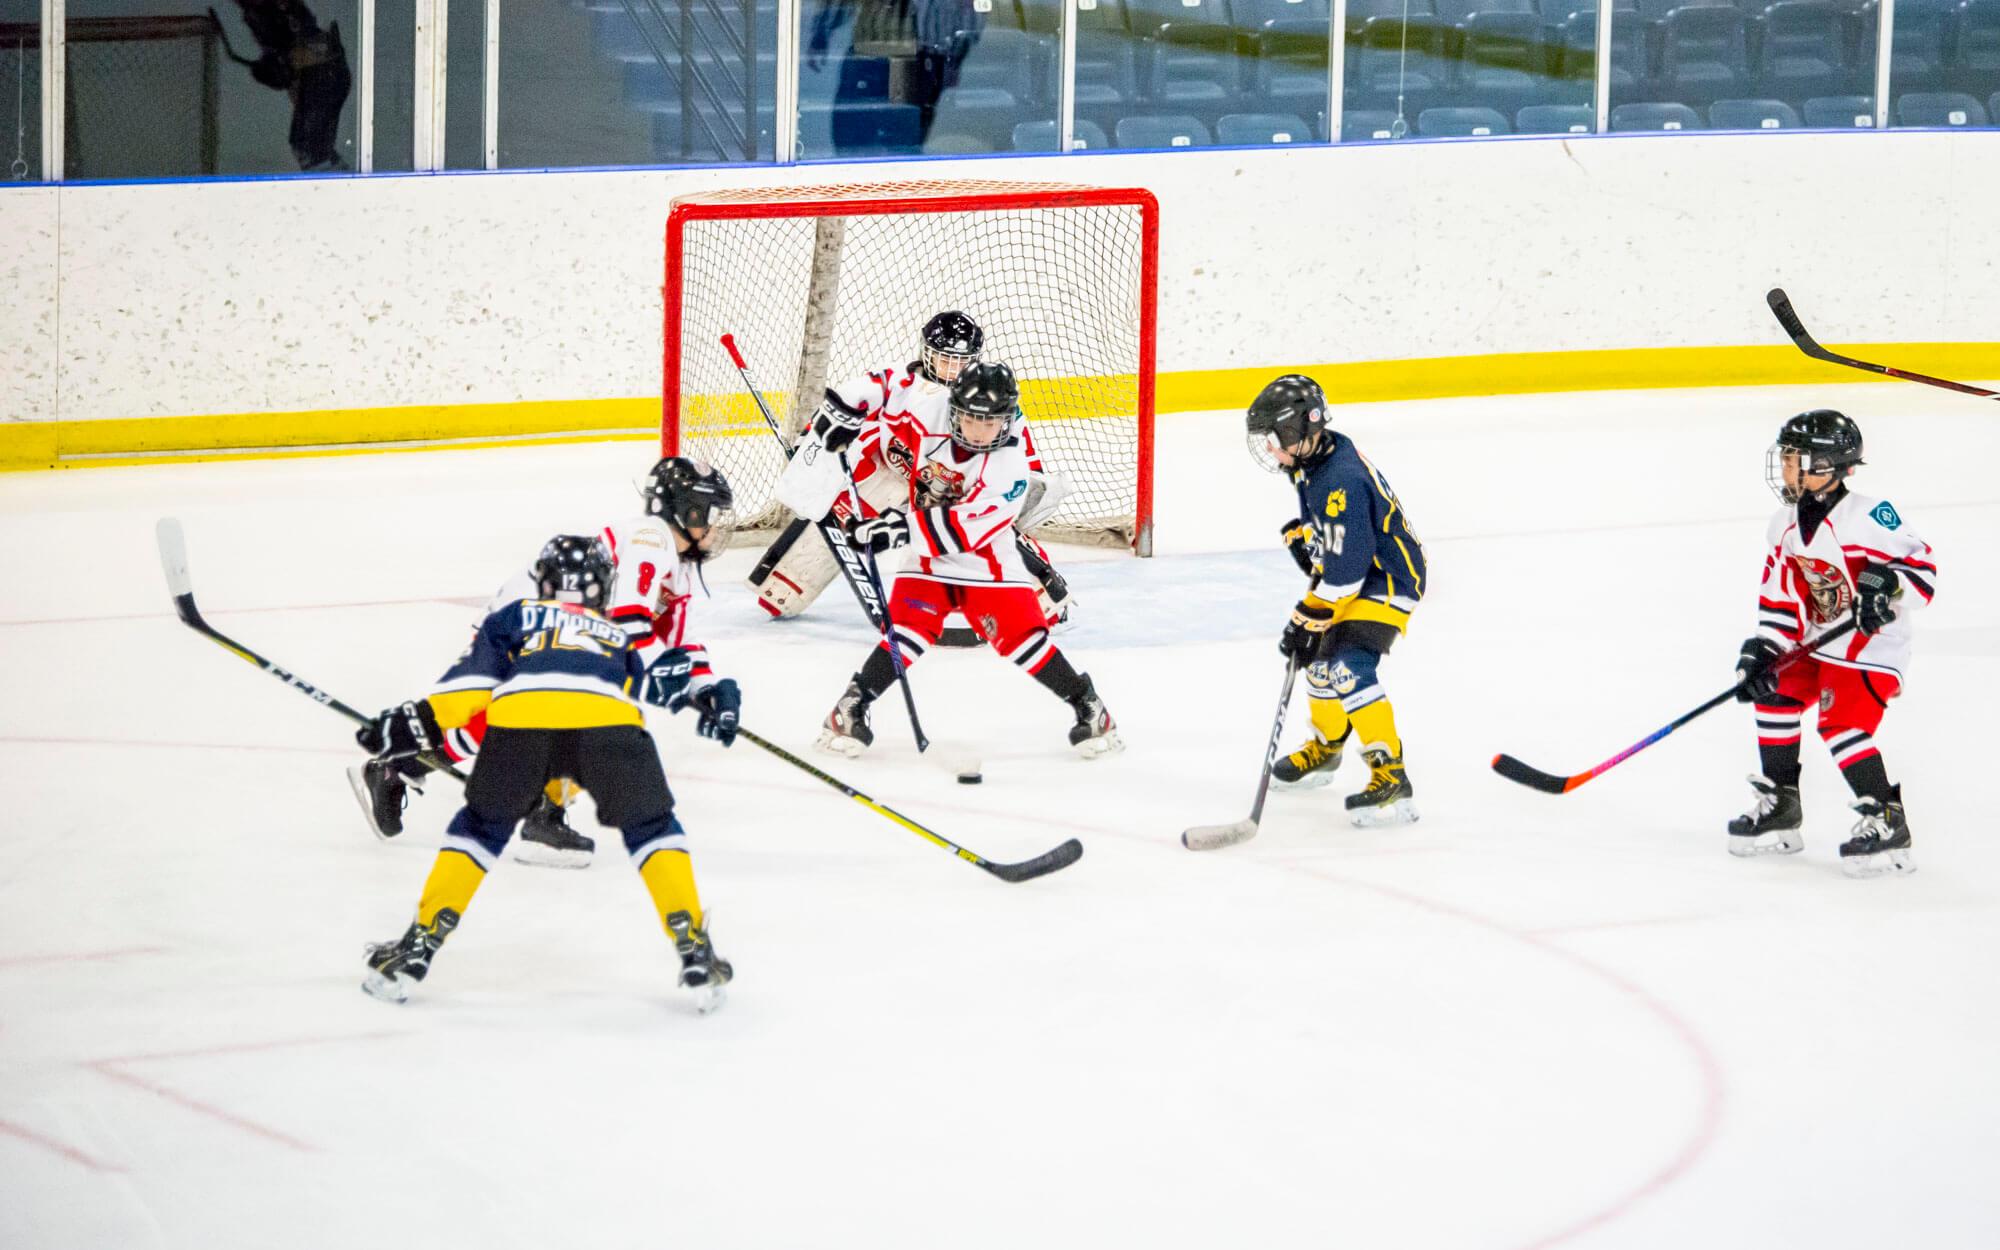 Hockey mineur Matane Sieurs Desjardins colisée tournoi Denis Labrie